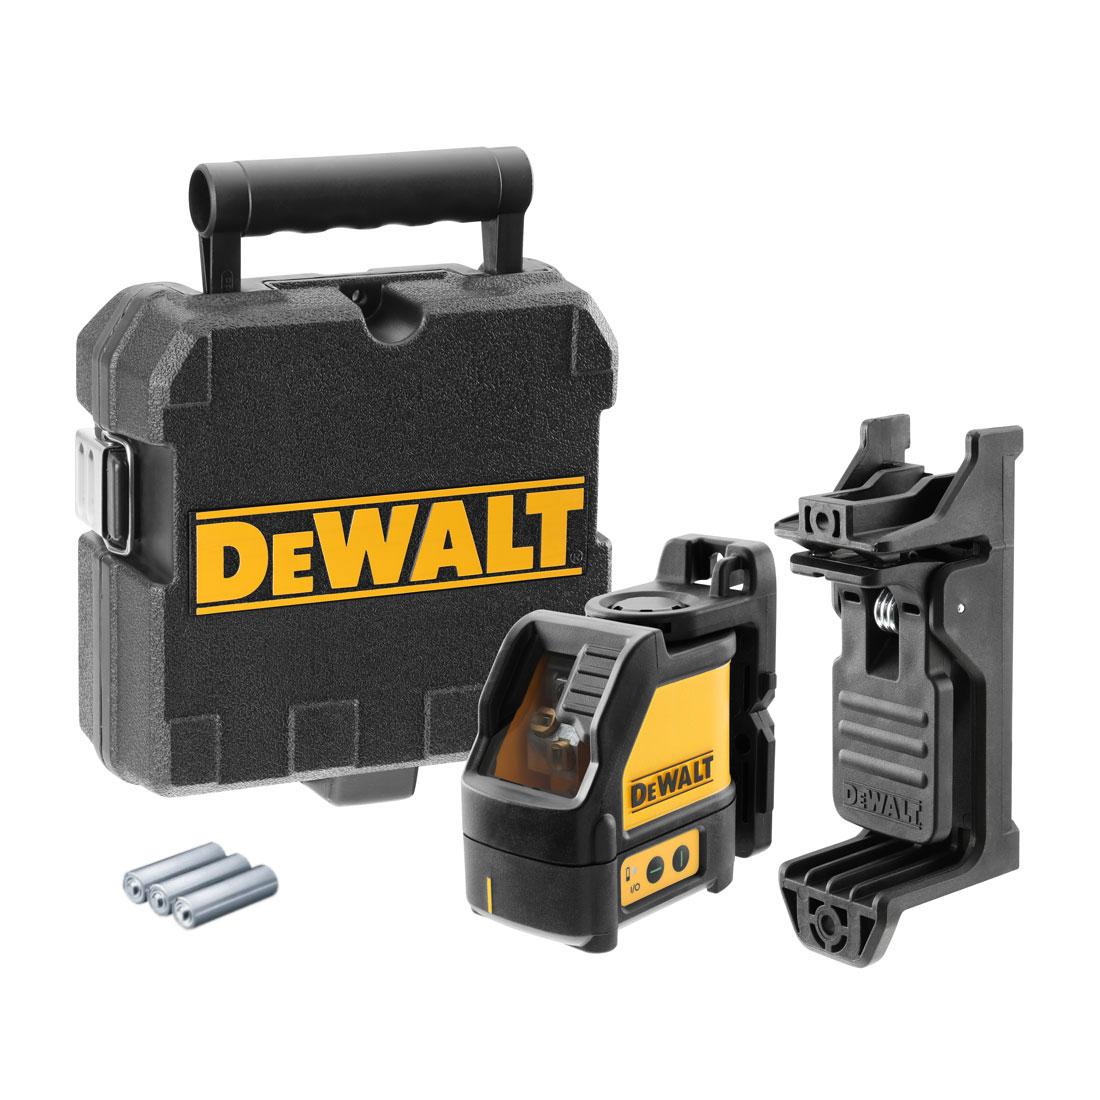 DeWalt DW088CG Green Beam Self Levelling Cross Line Laser Level Kit